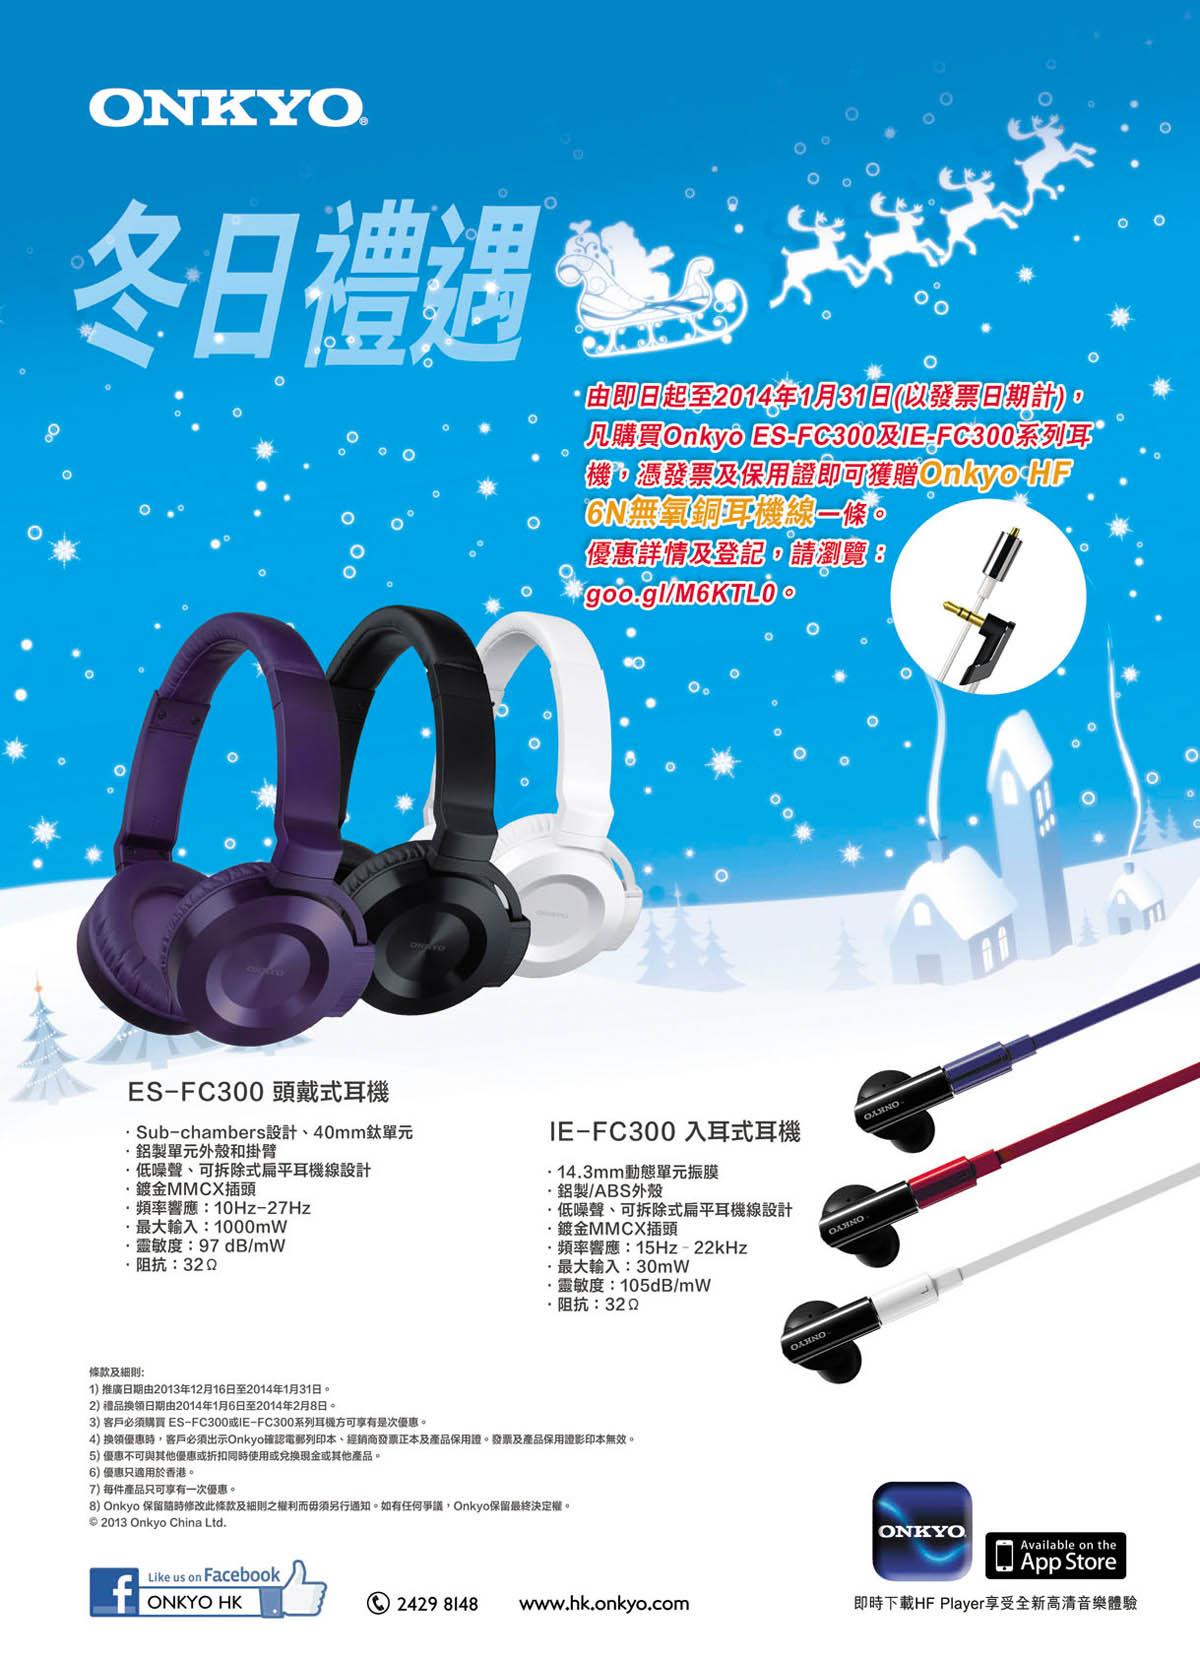 Onkyo 推手機專用耳機